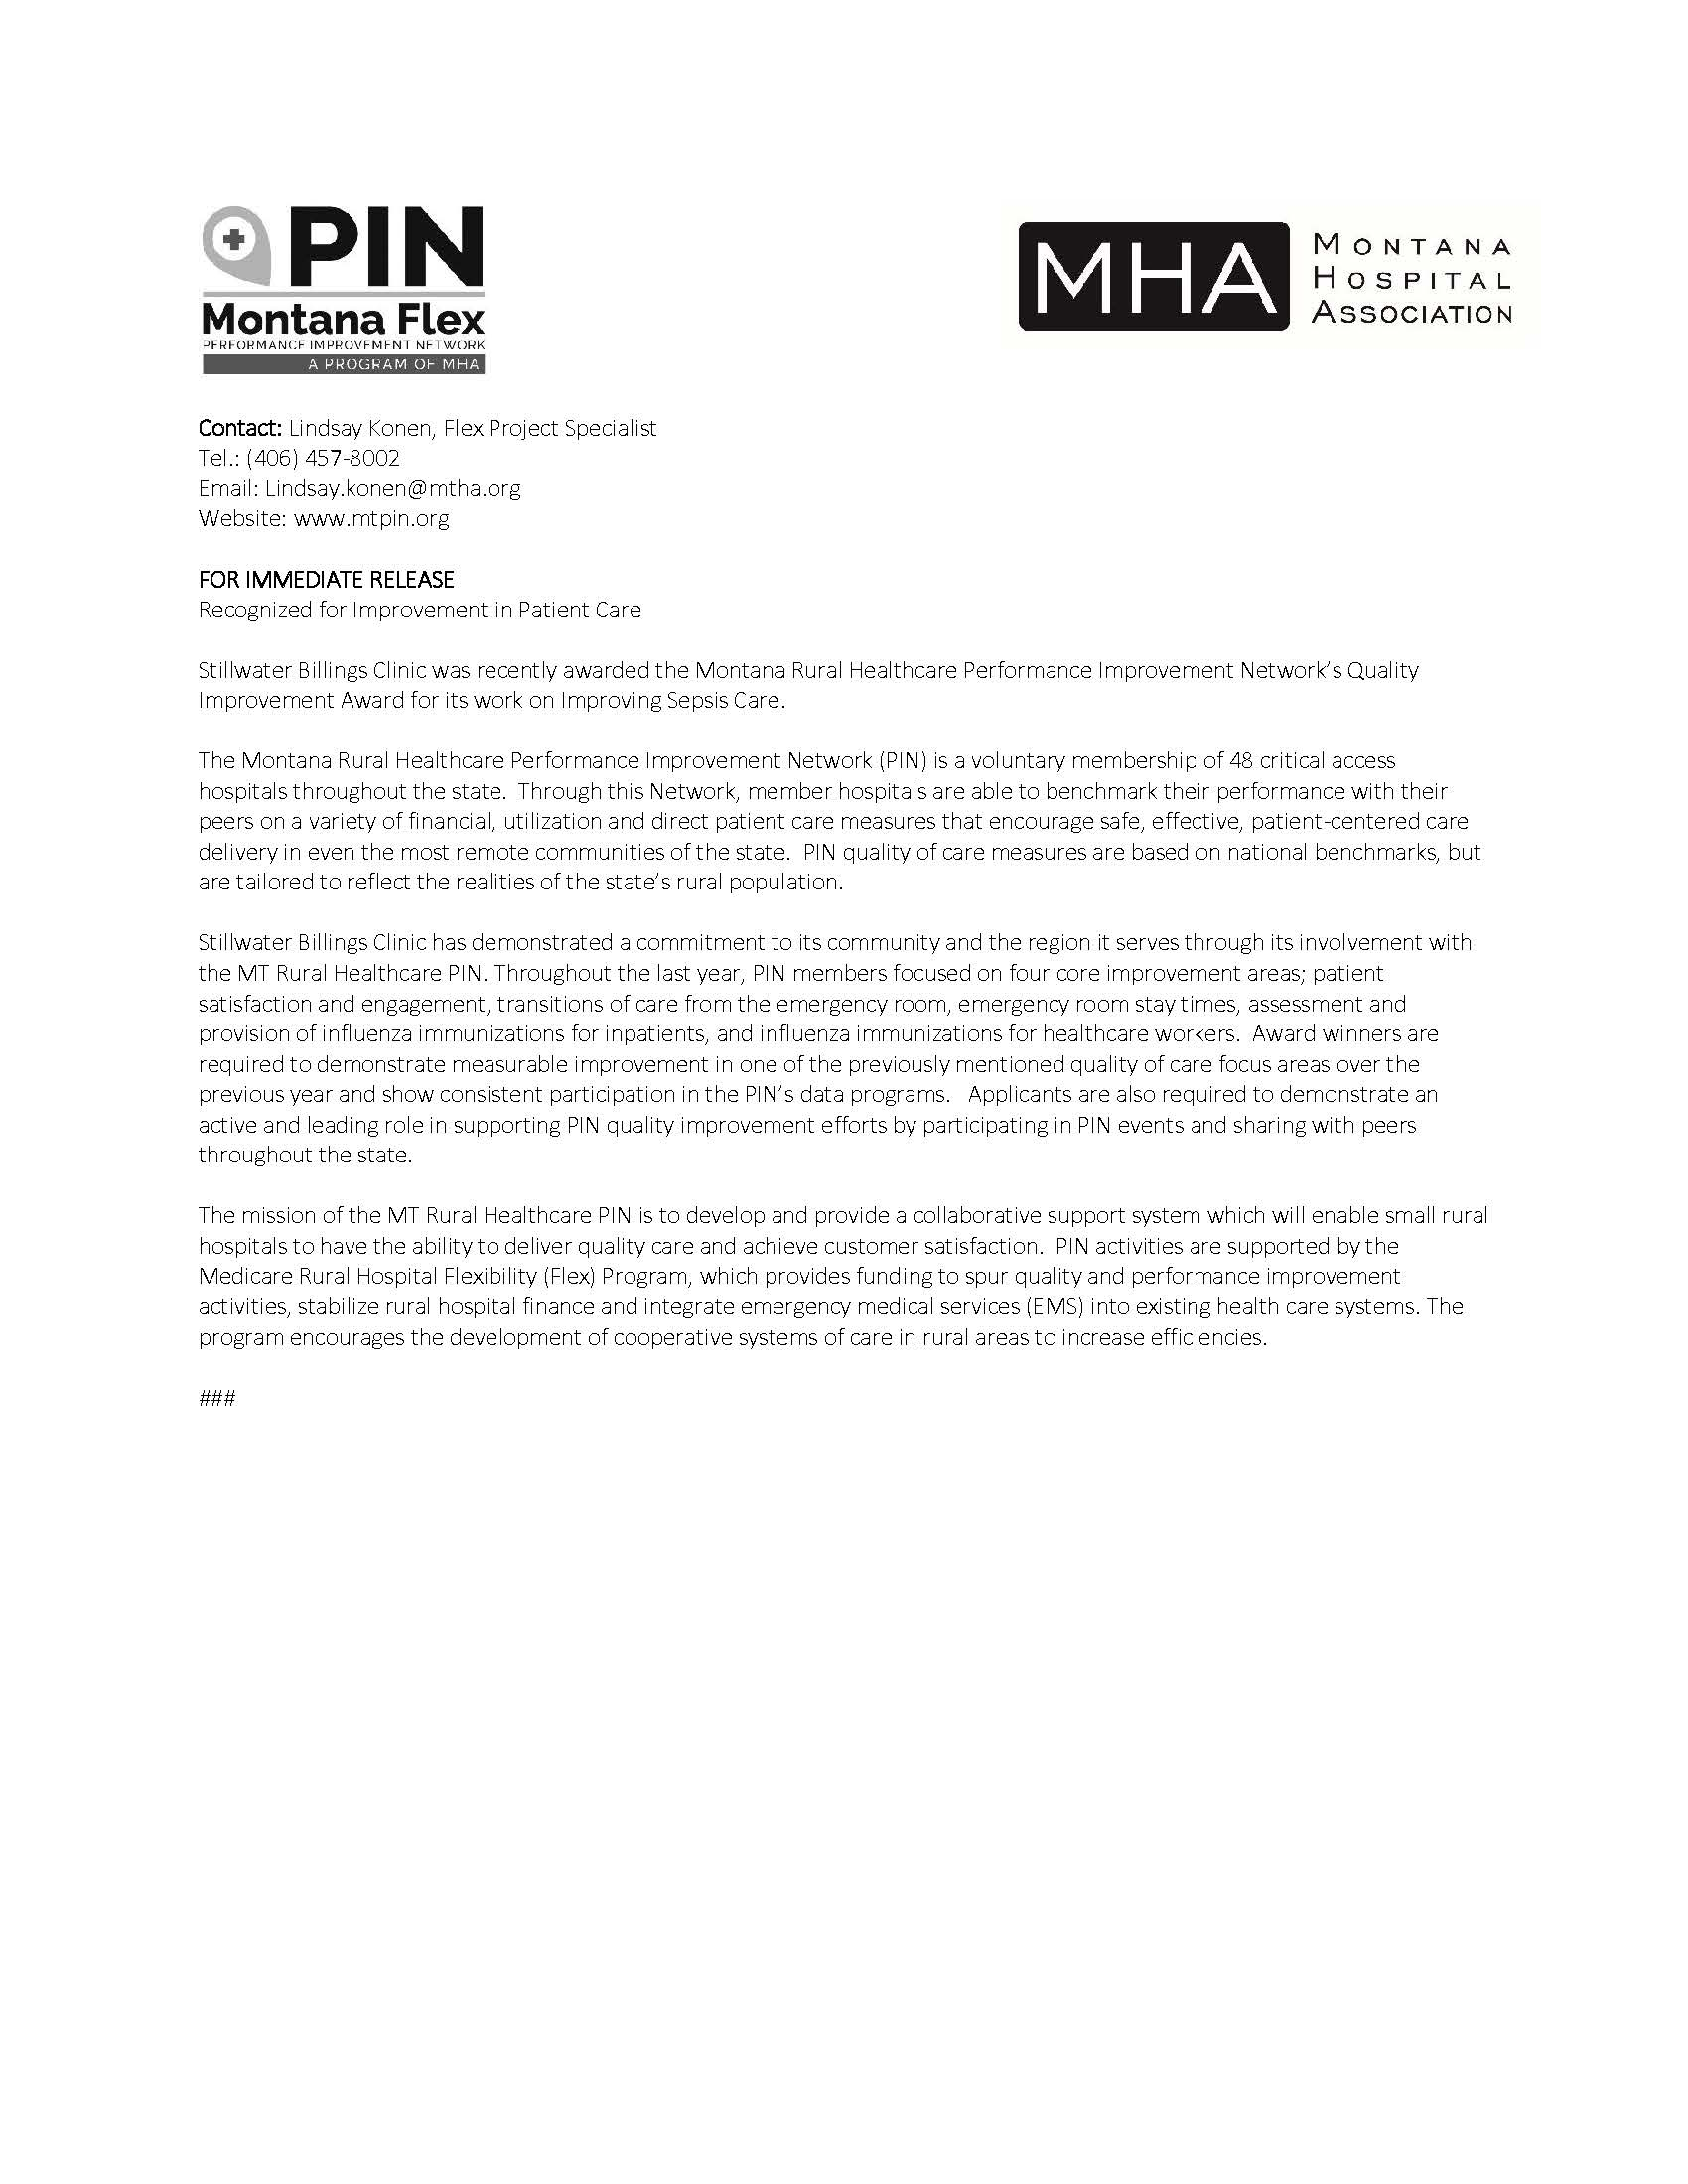 Stillwater Billings Clinic Receives PIN Award